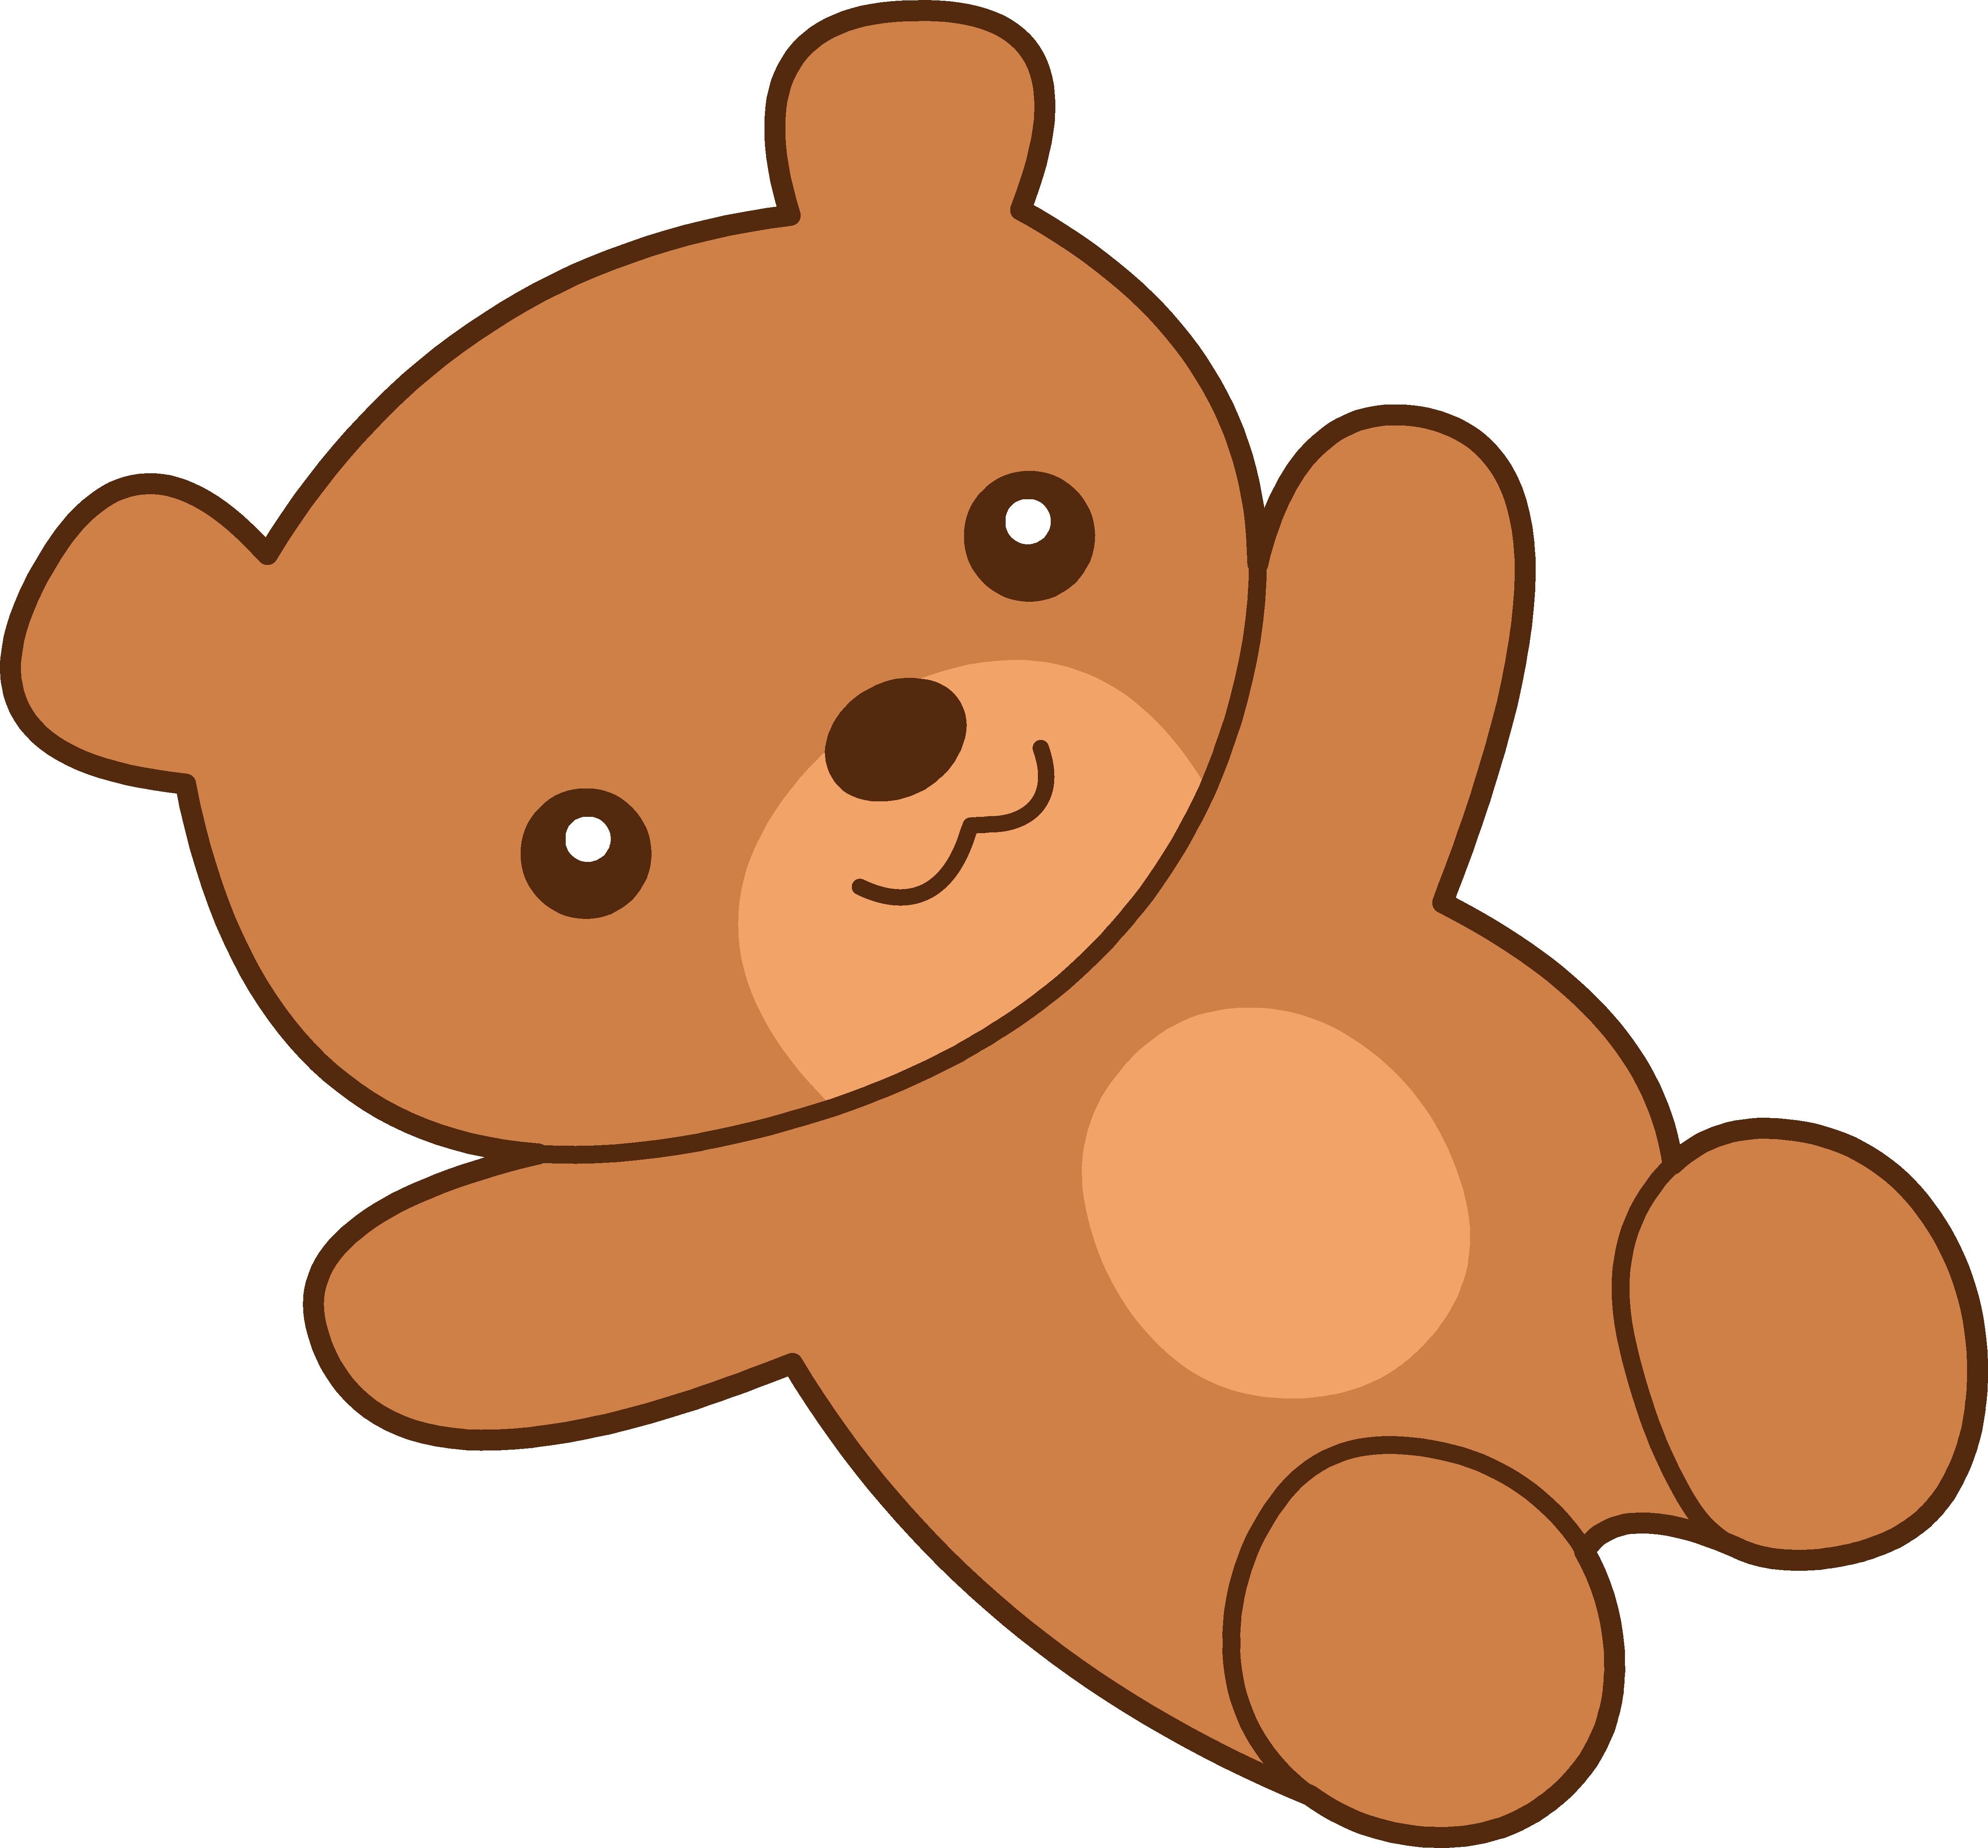 Free cute teddy bear clipart svg library library Free Teddy Bears Clipart, Download Free Clip Art, Free Clip Art on ... svg library library